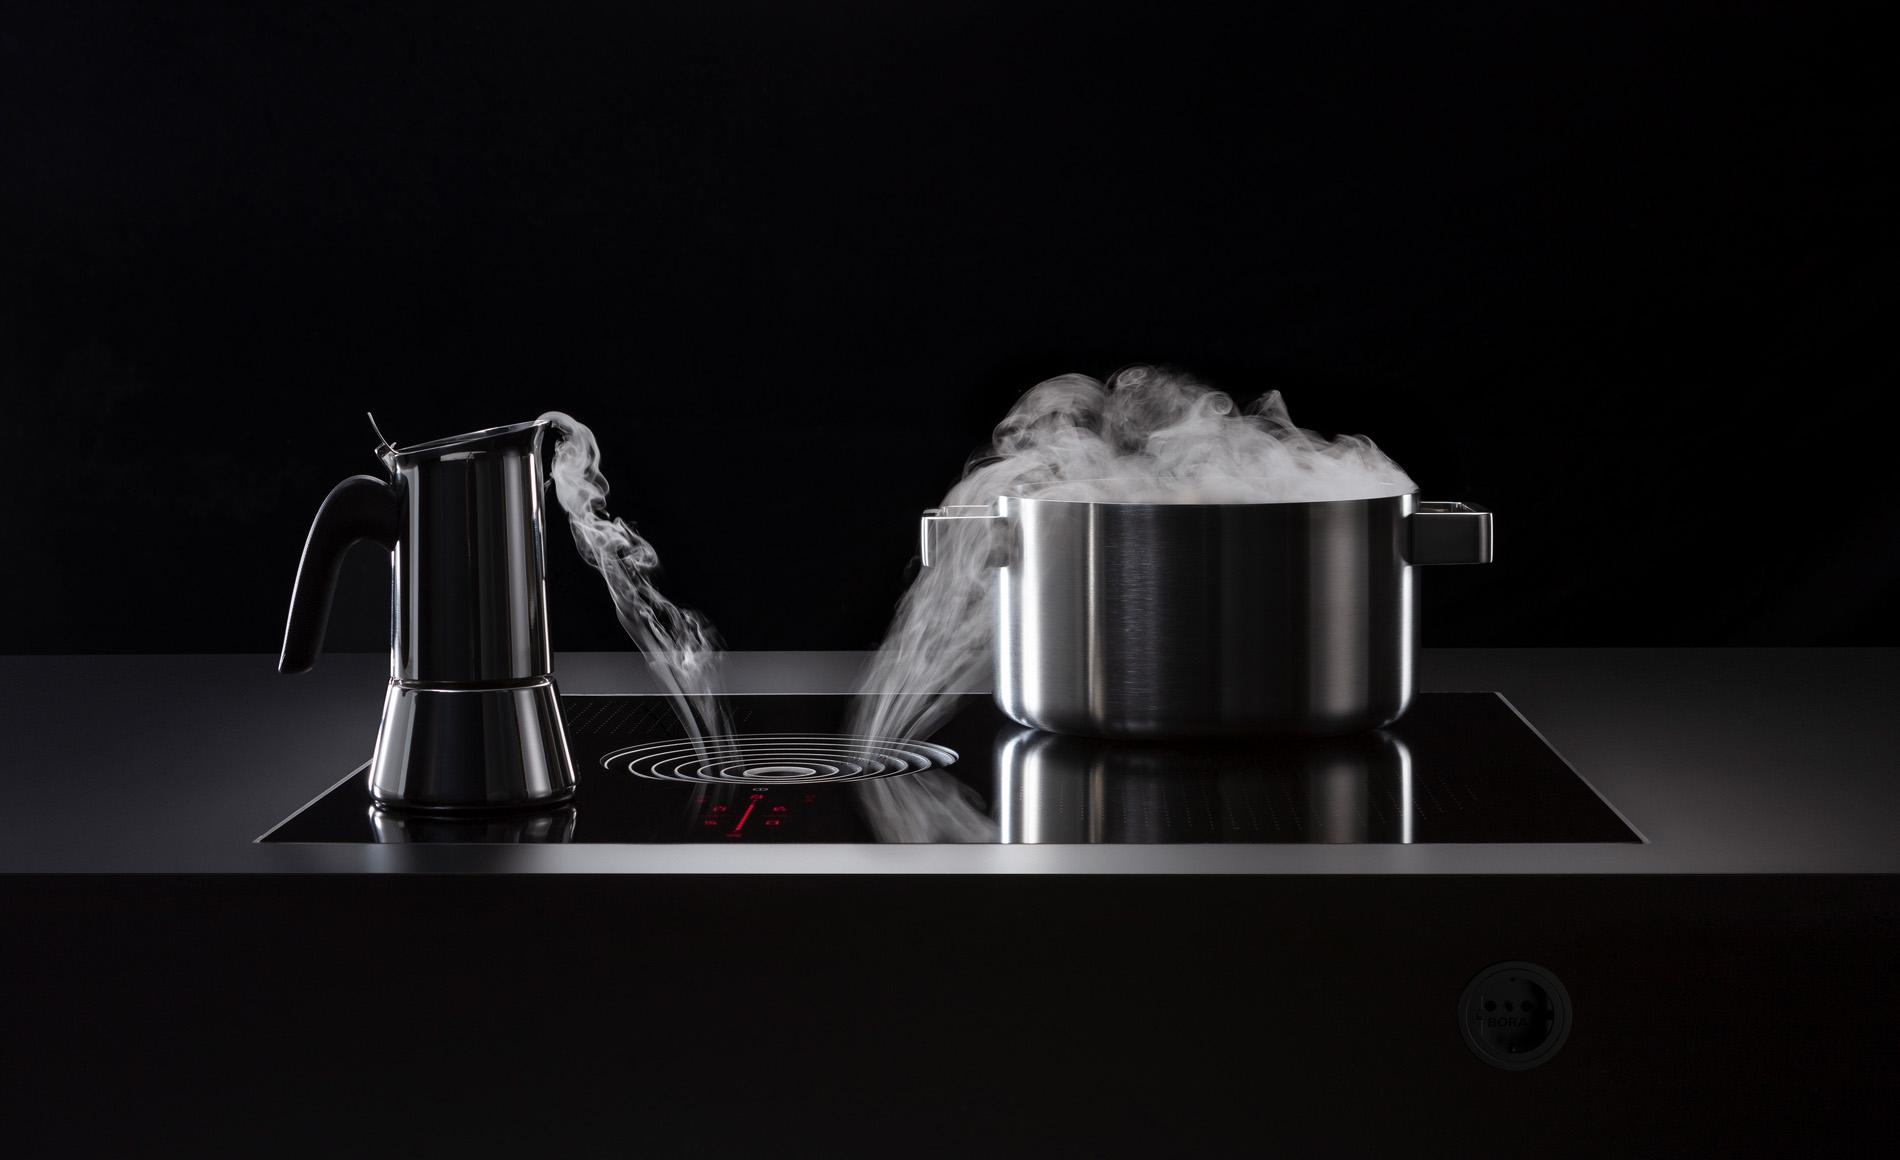 BORA S Pure kookplaat vlak geïntegreerd, Keukenapparatuur ASWA Keukens